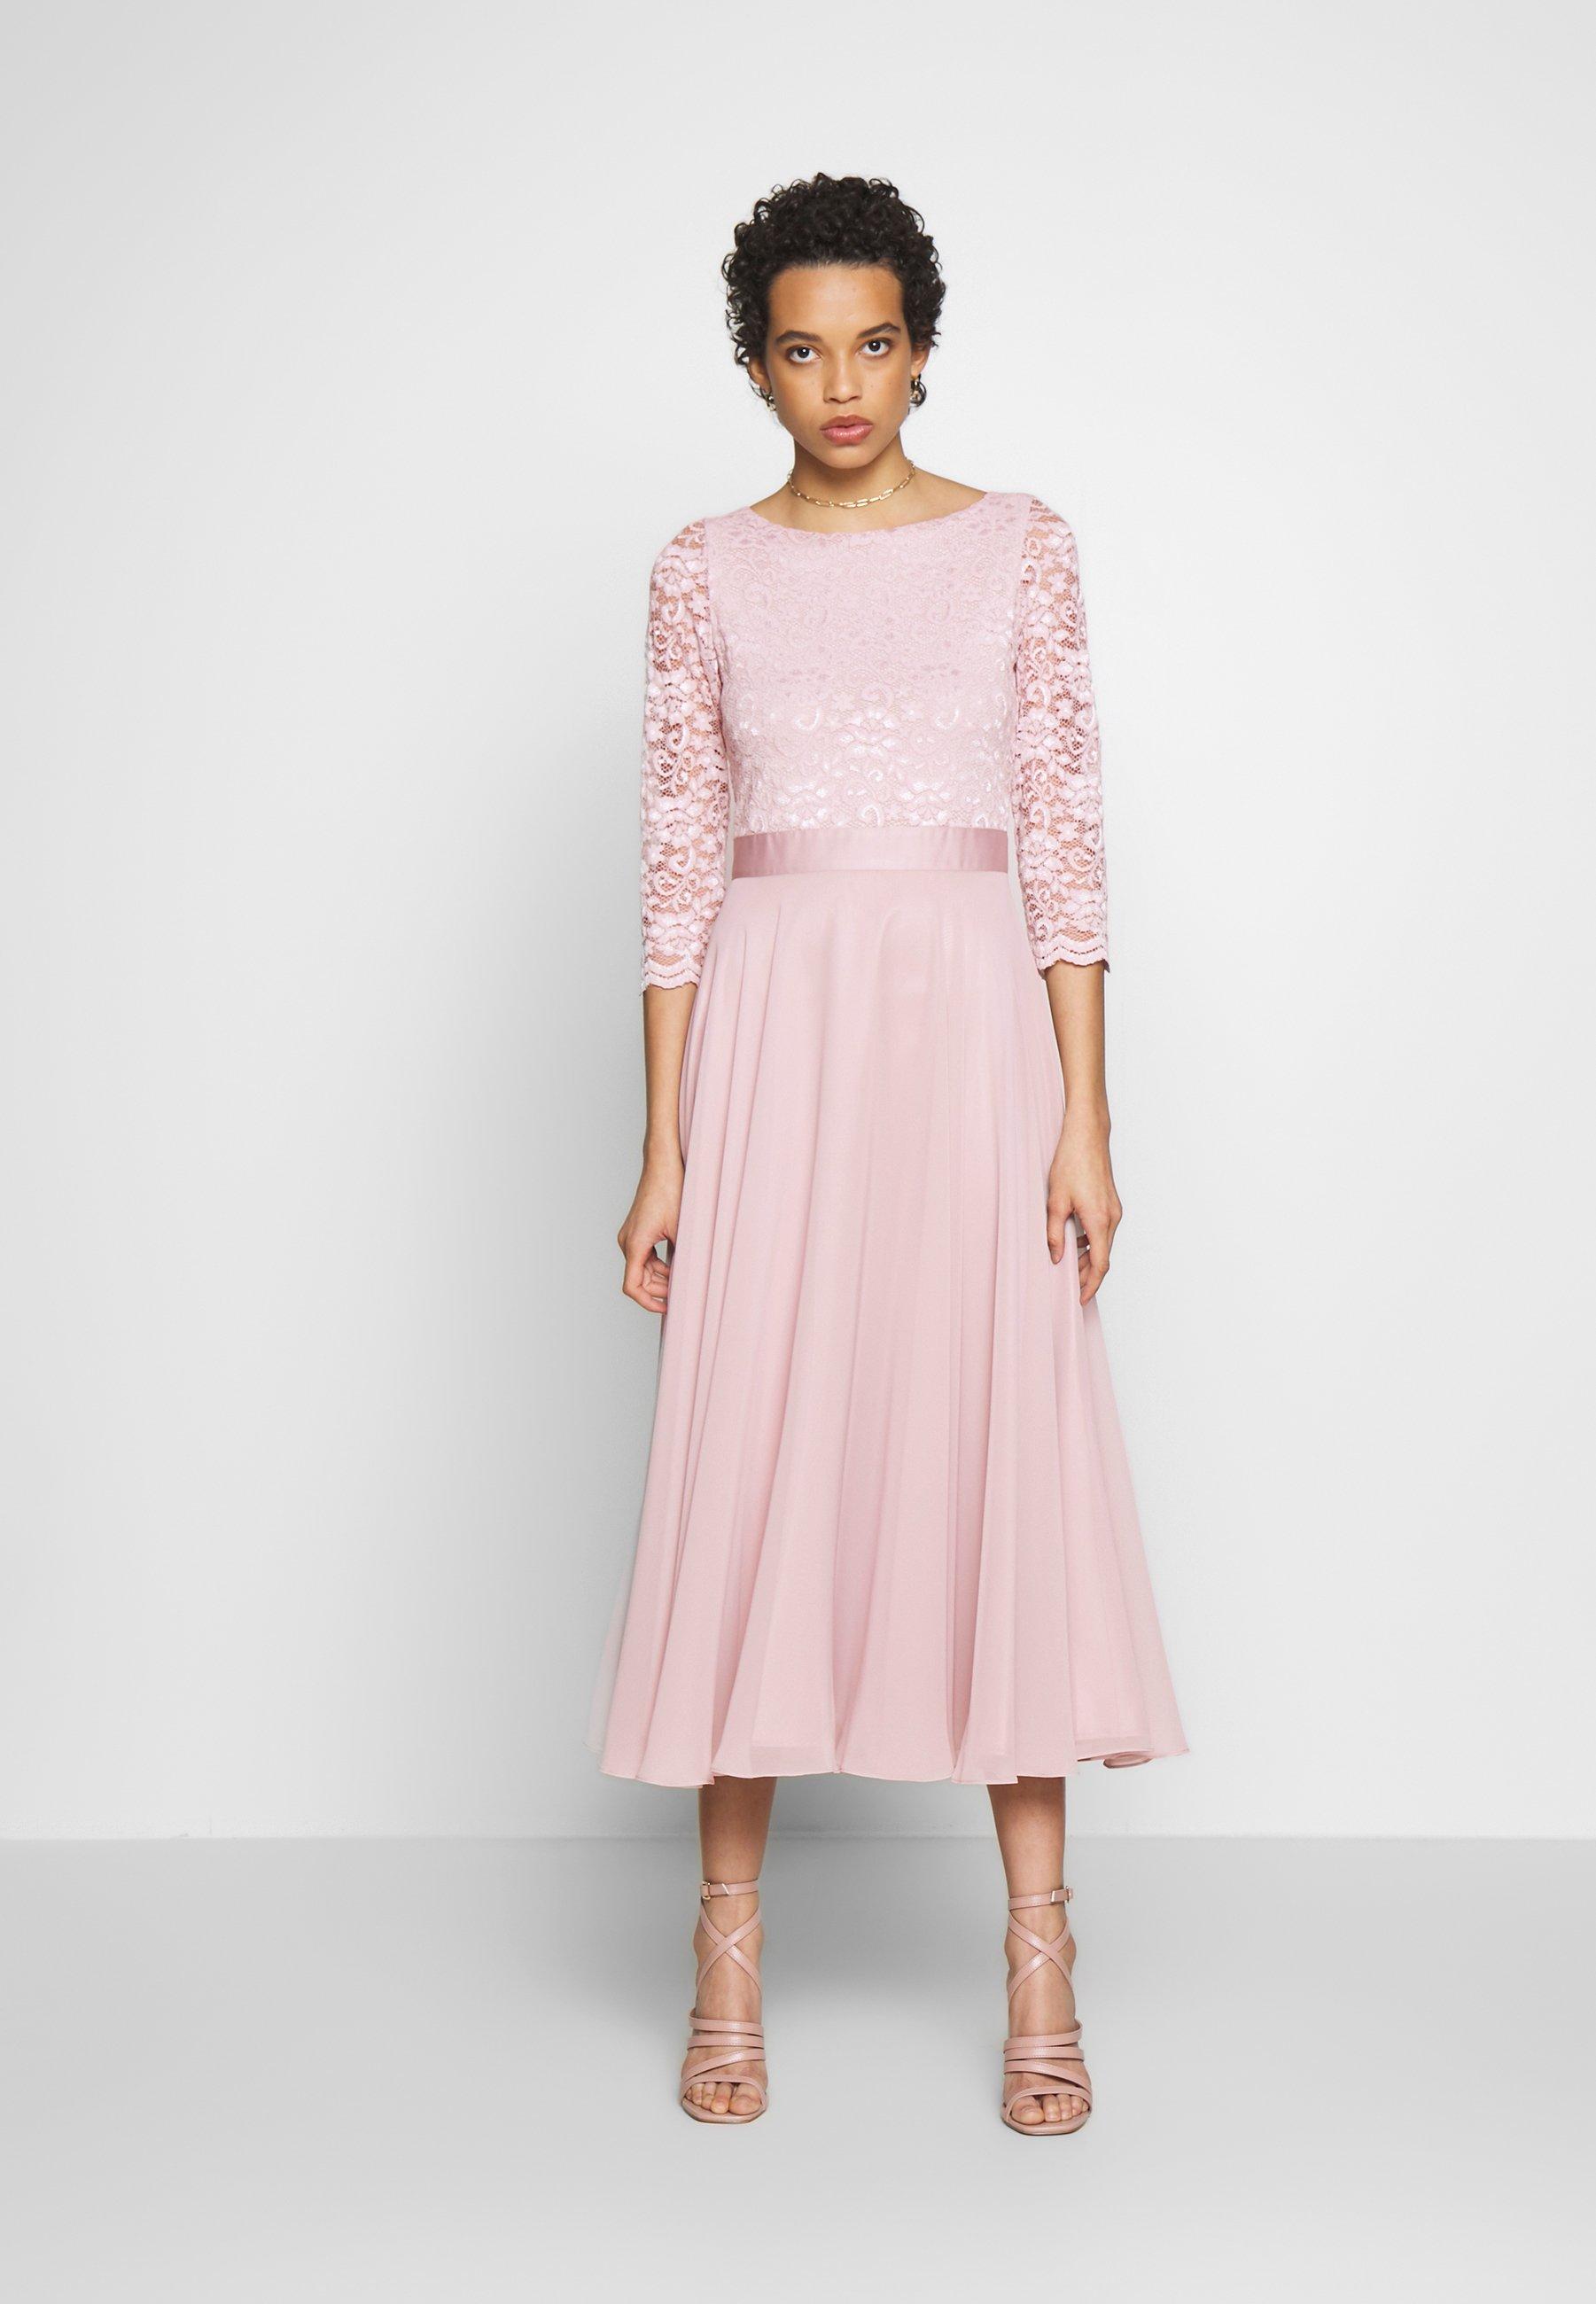 Swing Cocktailkleid/festliches Kleid   hellrosa/rosa   Zalando.de